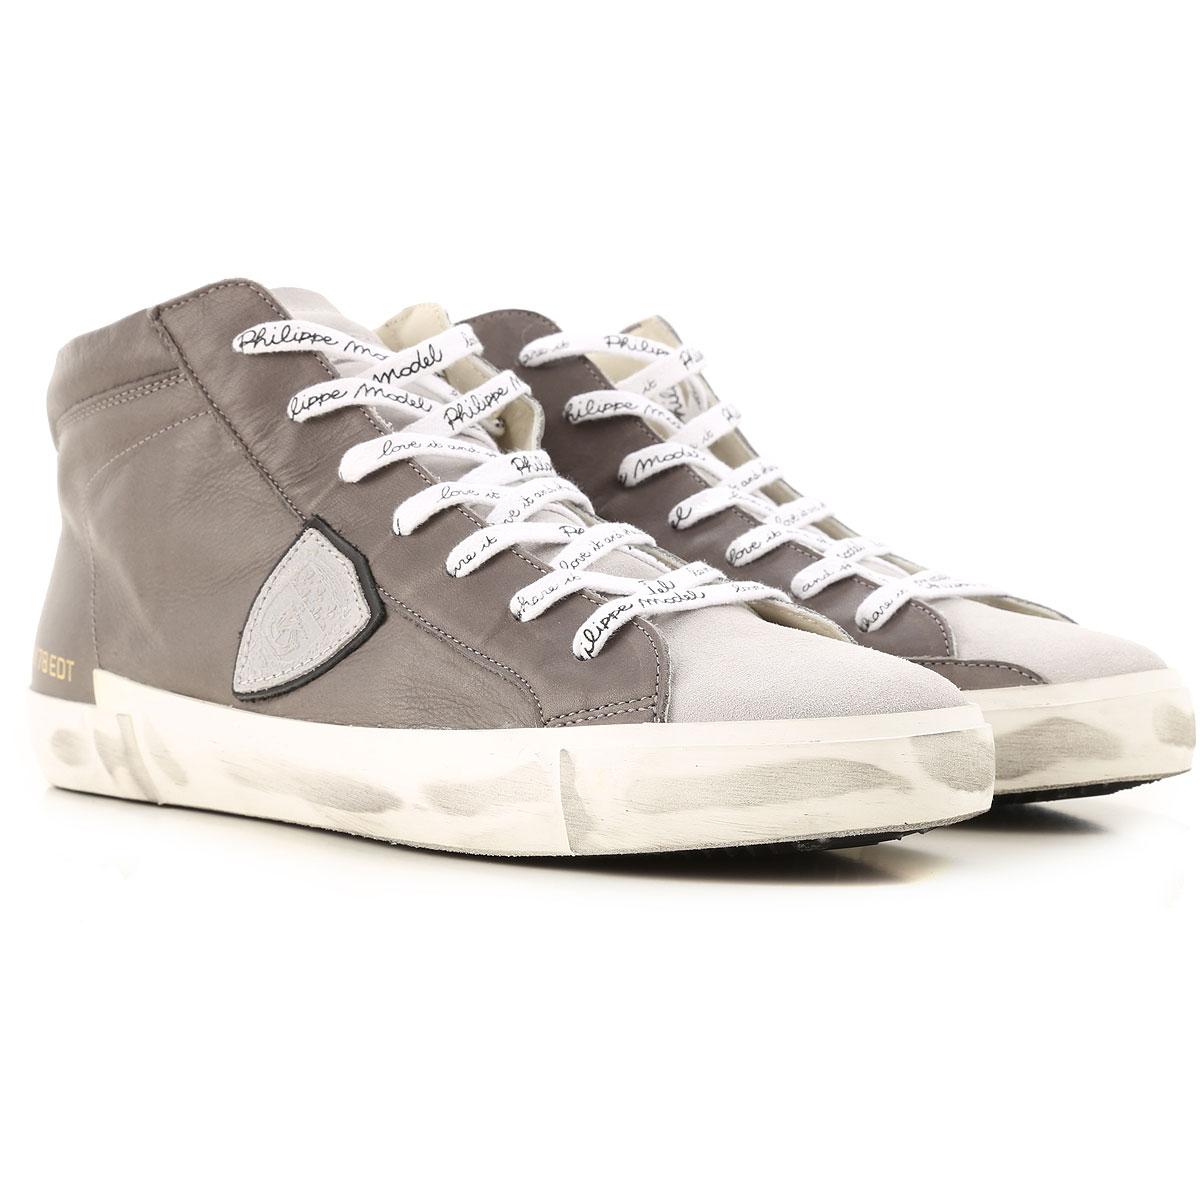 Philippe Model Sneakers for Men, Dark Grey, Leather, 2019, 8 9